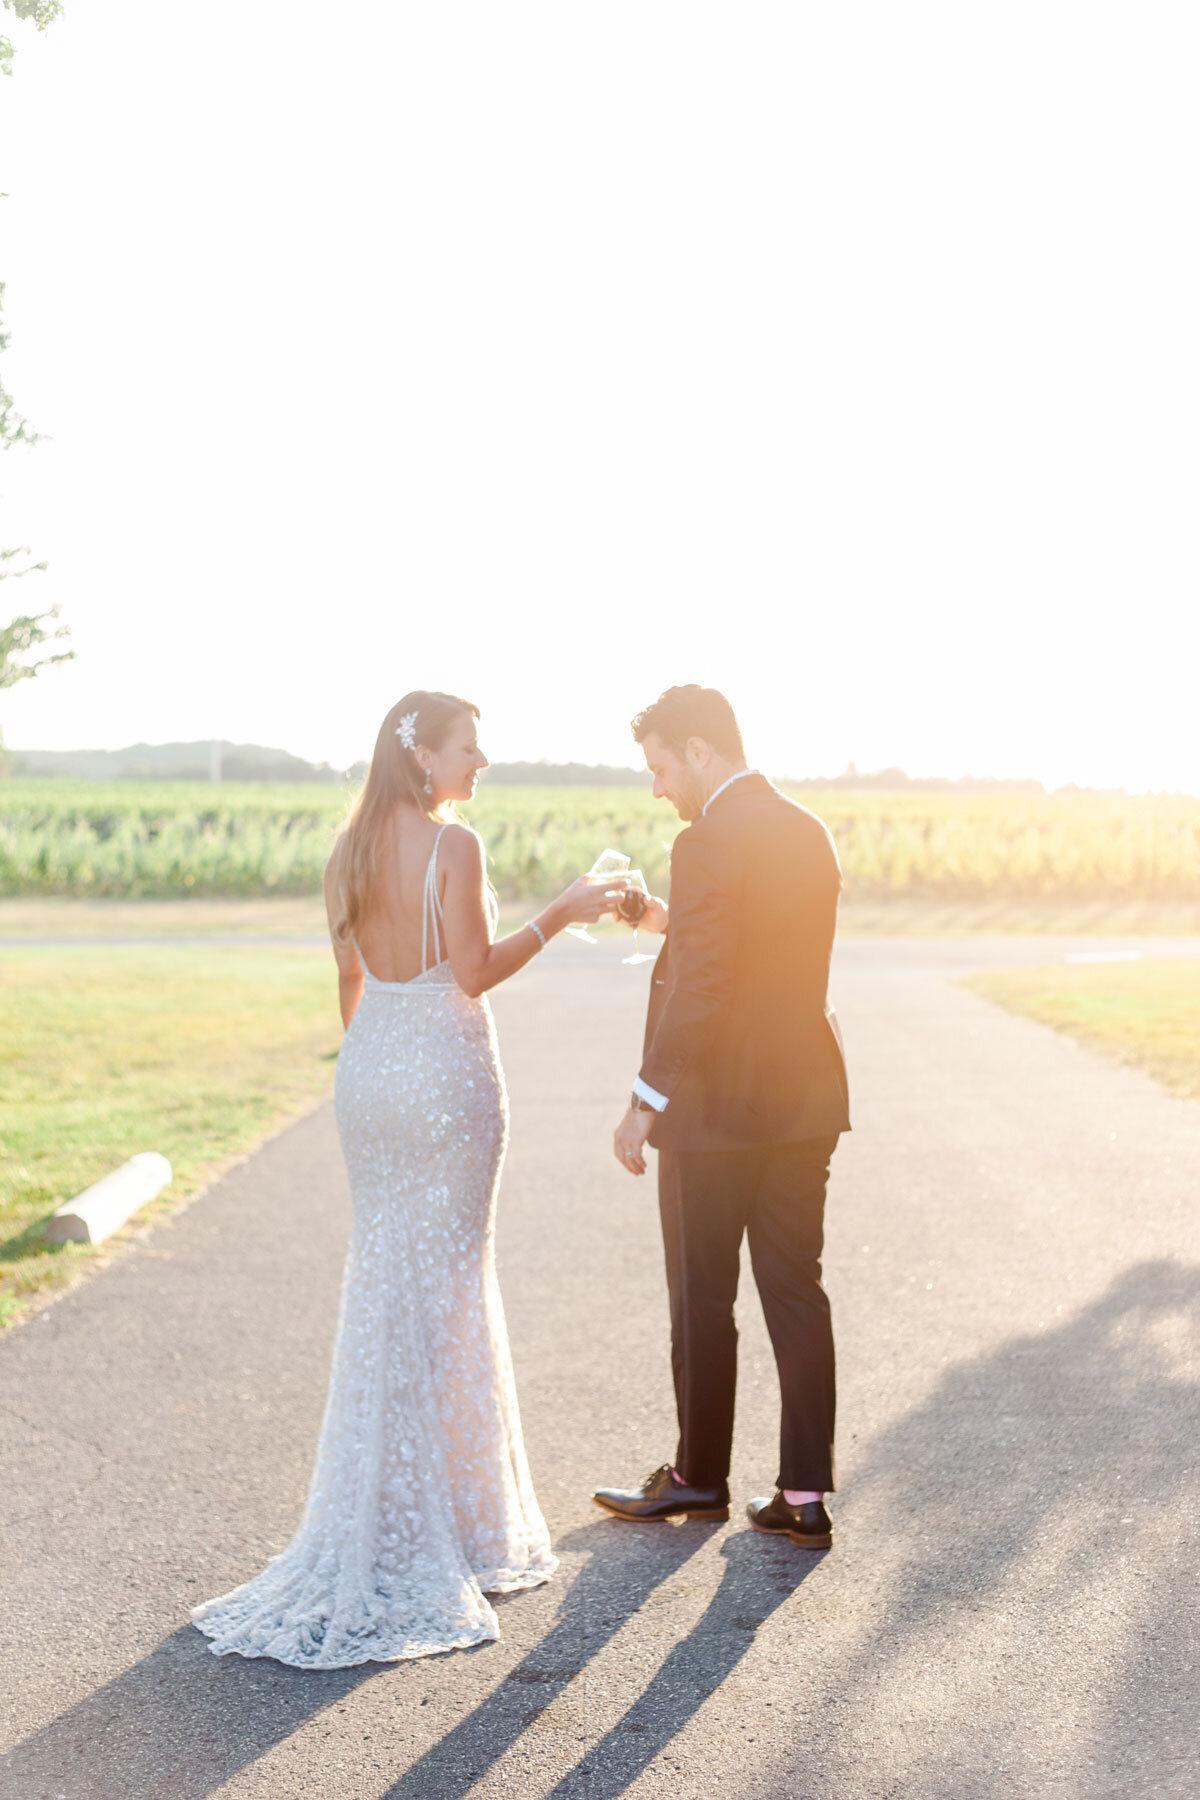 Chateau-des-Charmes-Wedding-Summer-Vineyard-Bride-Niagara-on-the-Lake-photos-by-Gemini-Photography-Ontario-0071.jpg